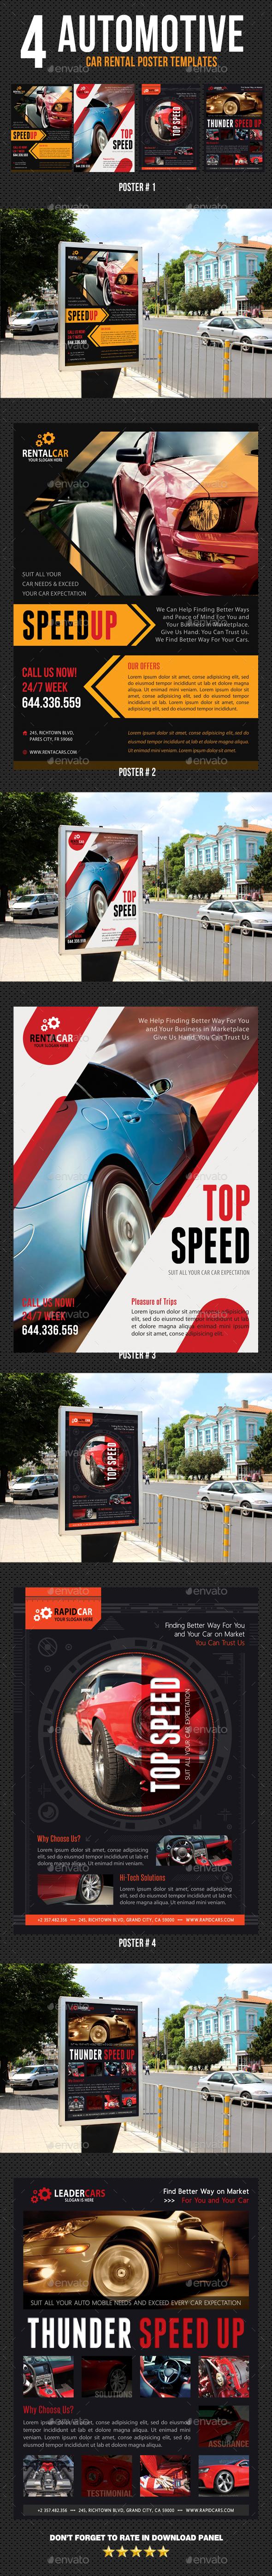 4 Automotive Car Rental Poster Bundle 02 - Signage Print Templates